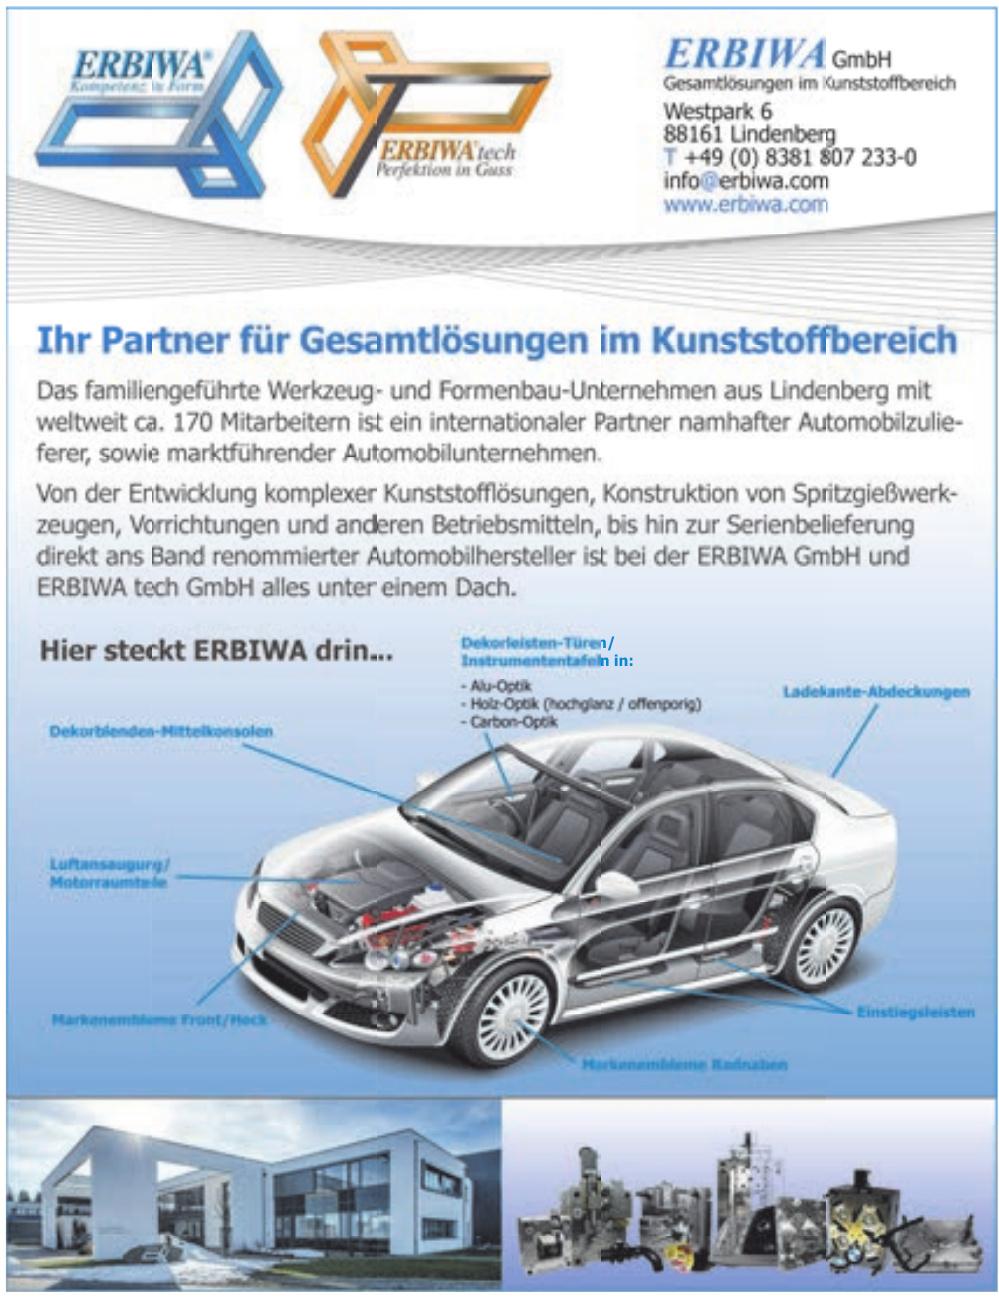 Erbiwa GmbH